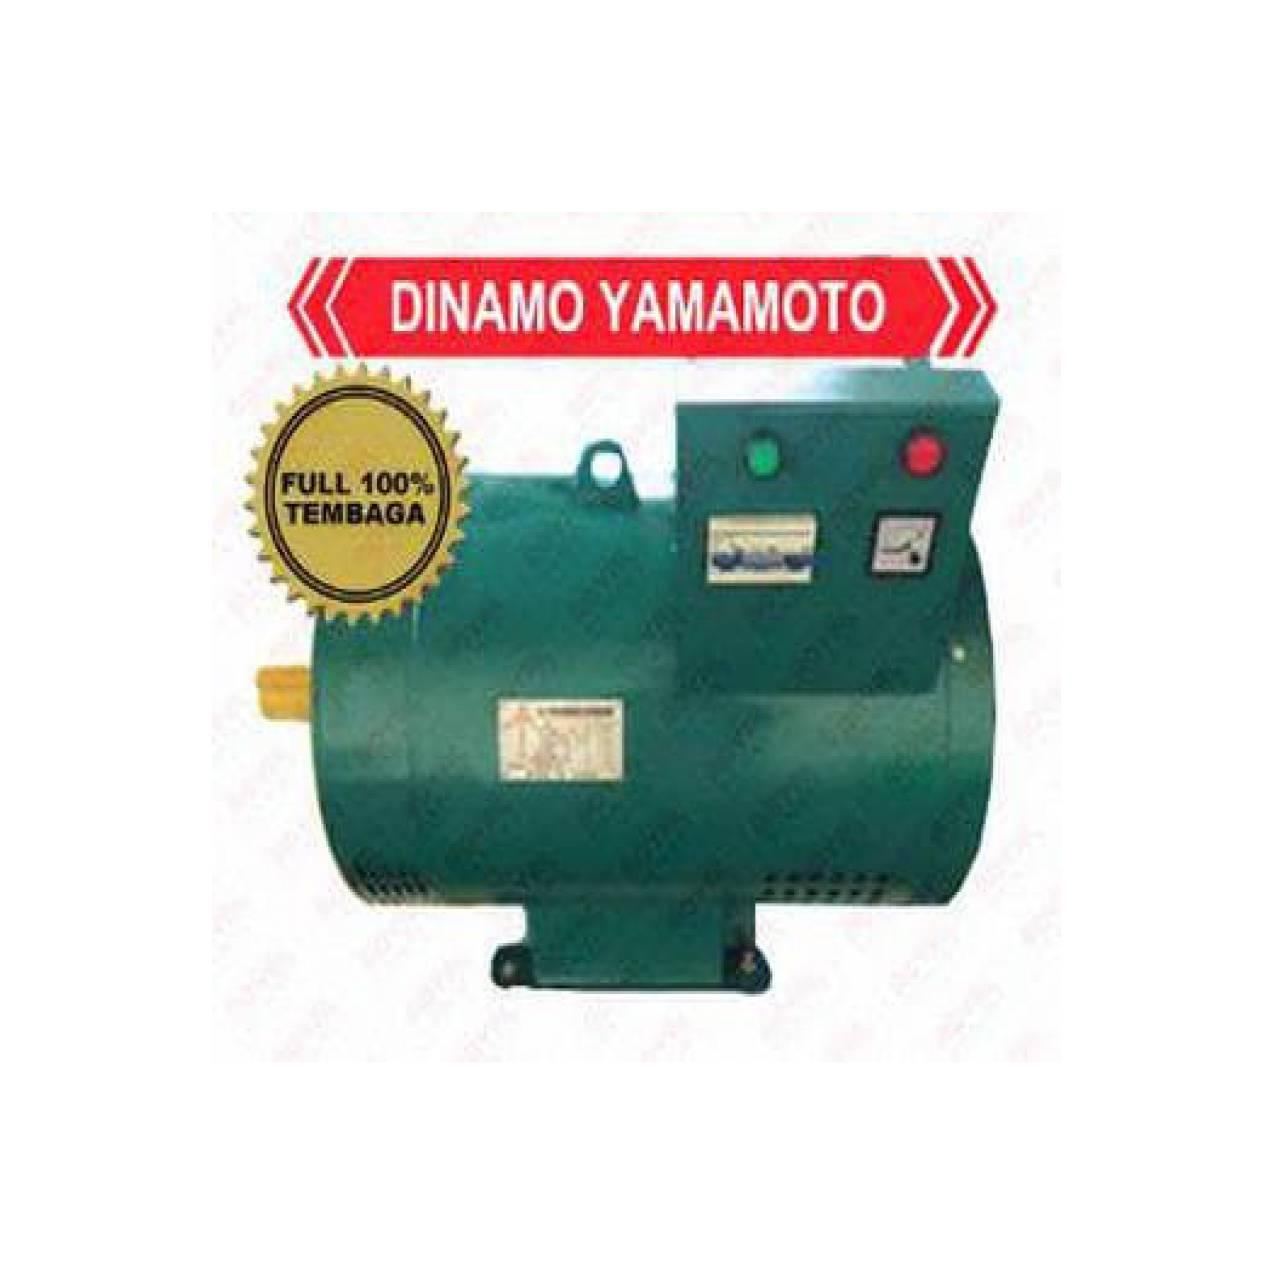 Poseidon Electro Motor Dinamo listrik 1 3 HP 3 phase 1450rpm Abu Source · Tenaga generator